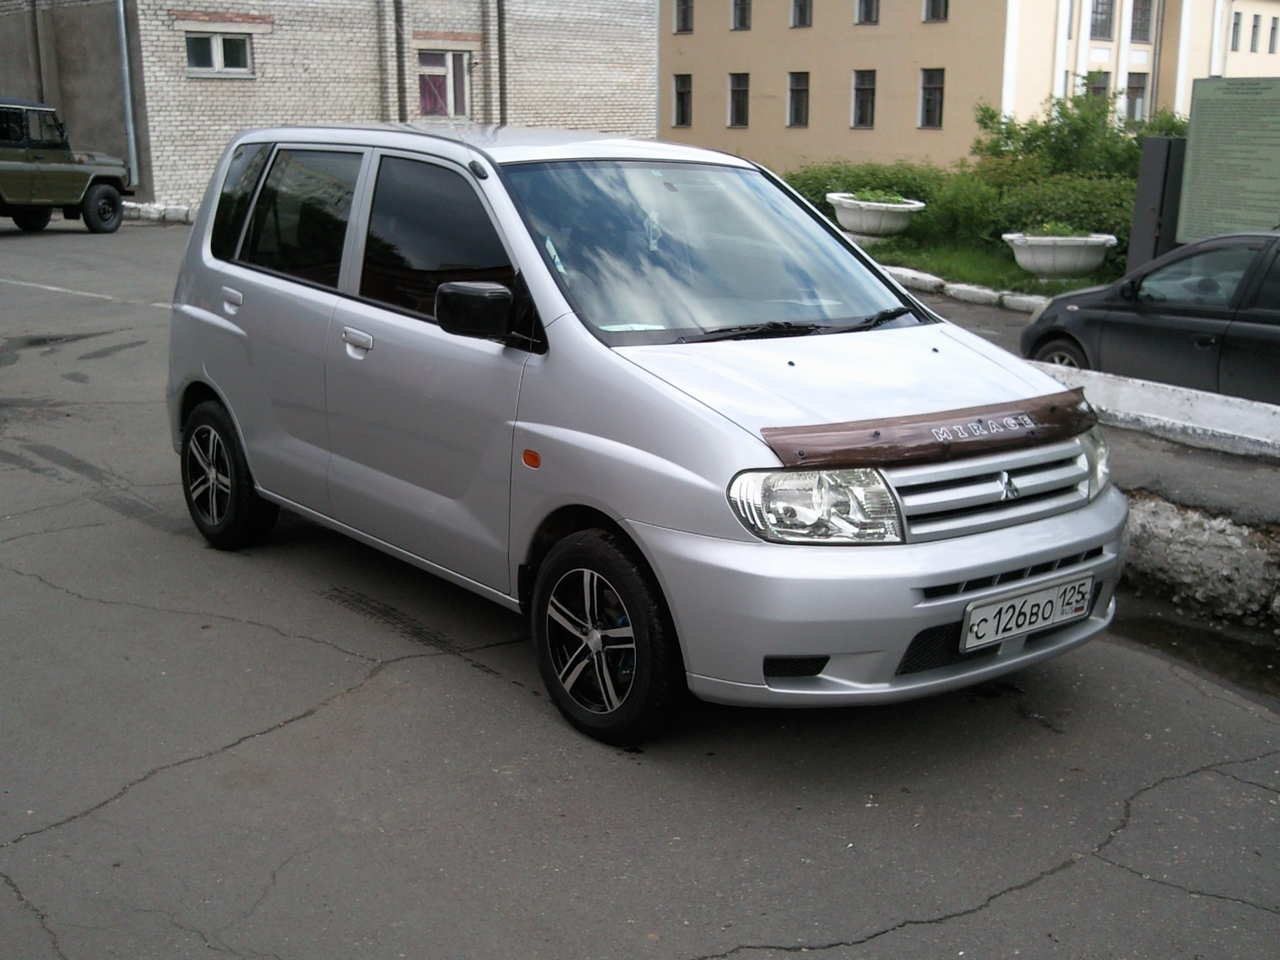 2002 Mitsubishi Dingo Photos  1 3  Gasoline  Ff  Automatic